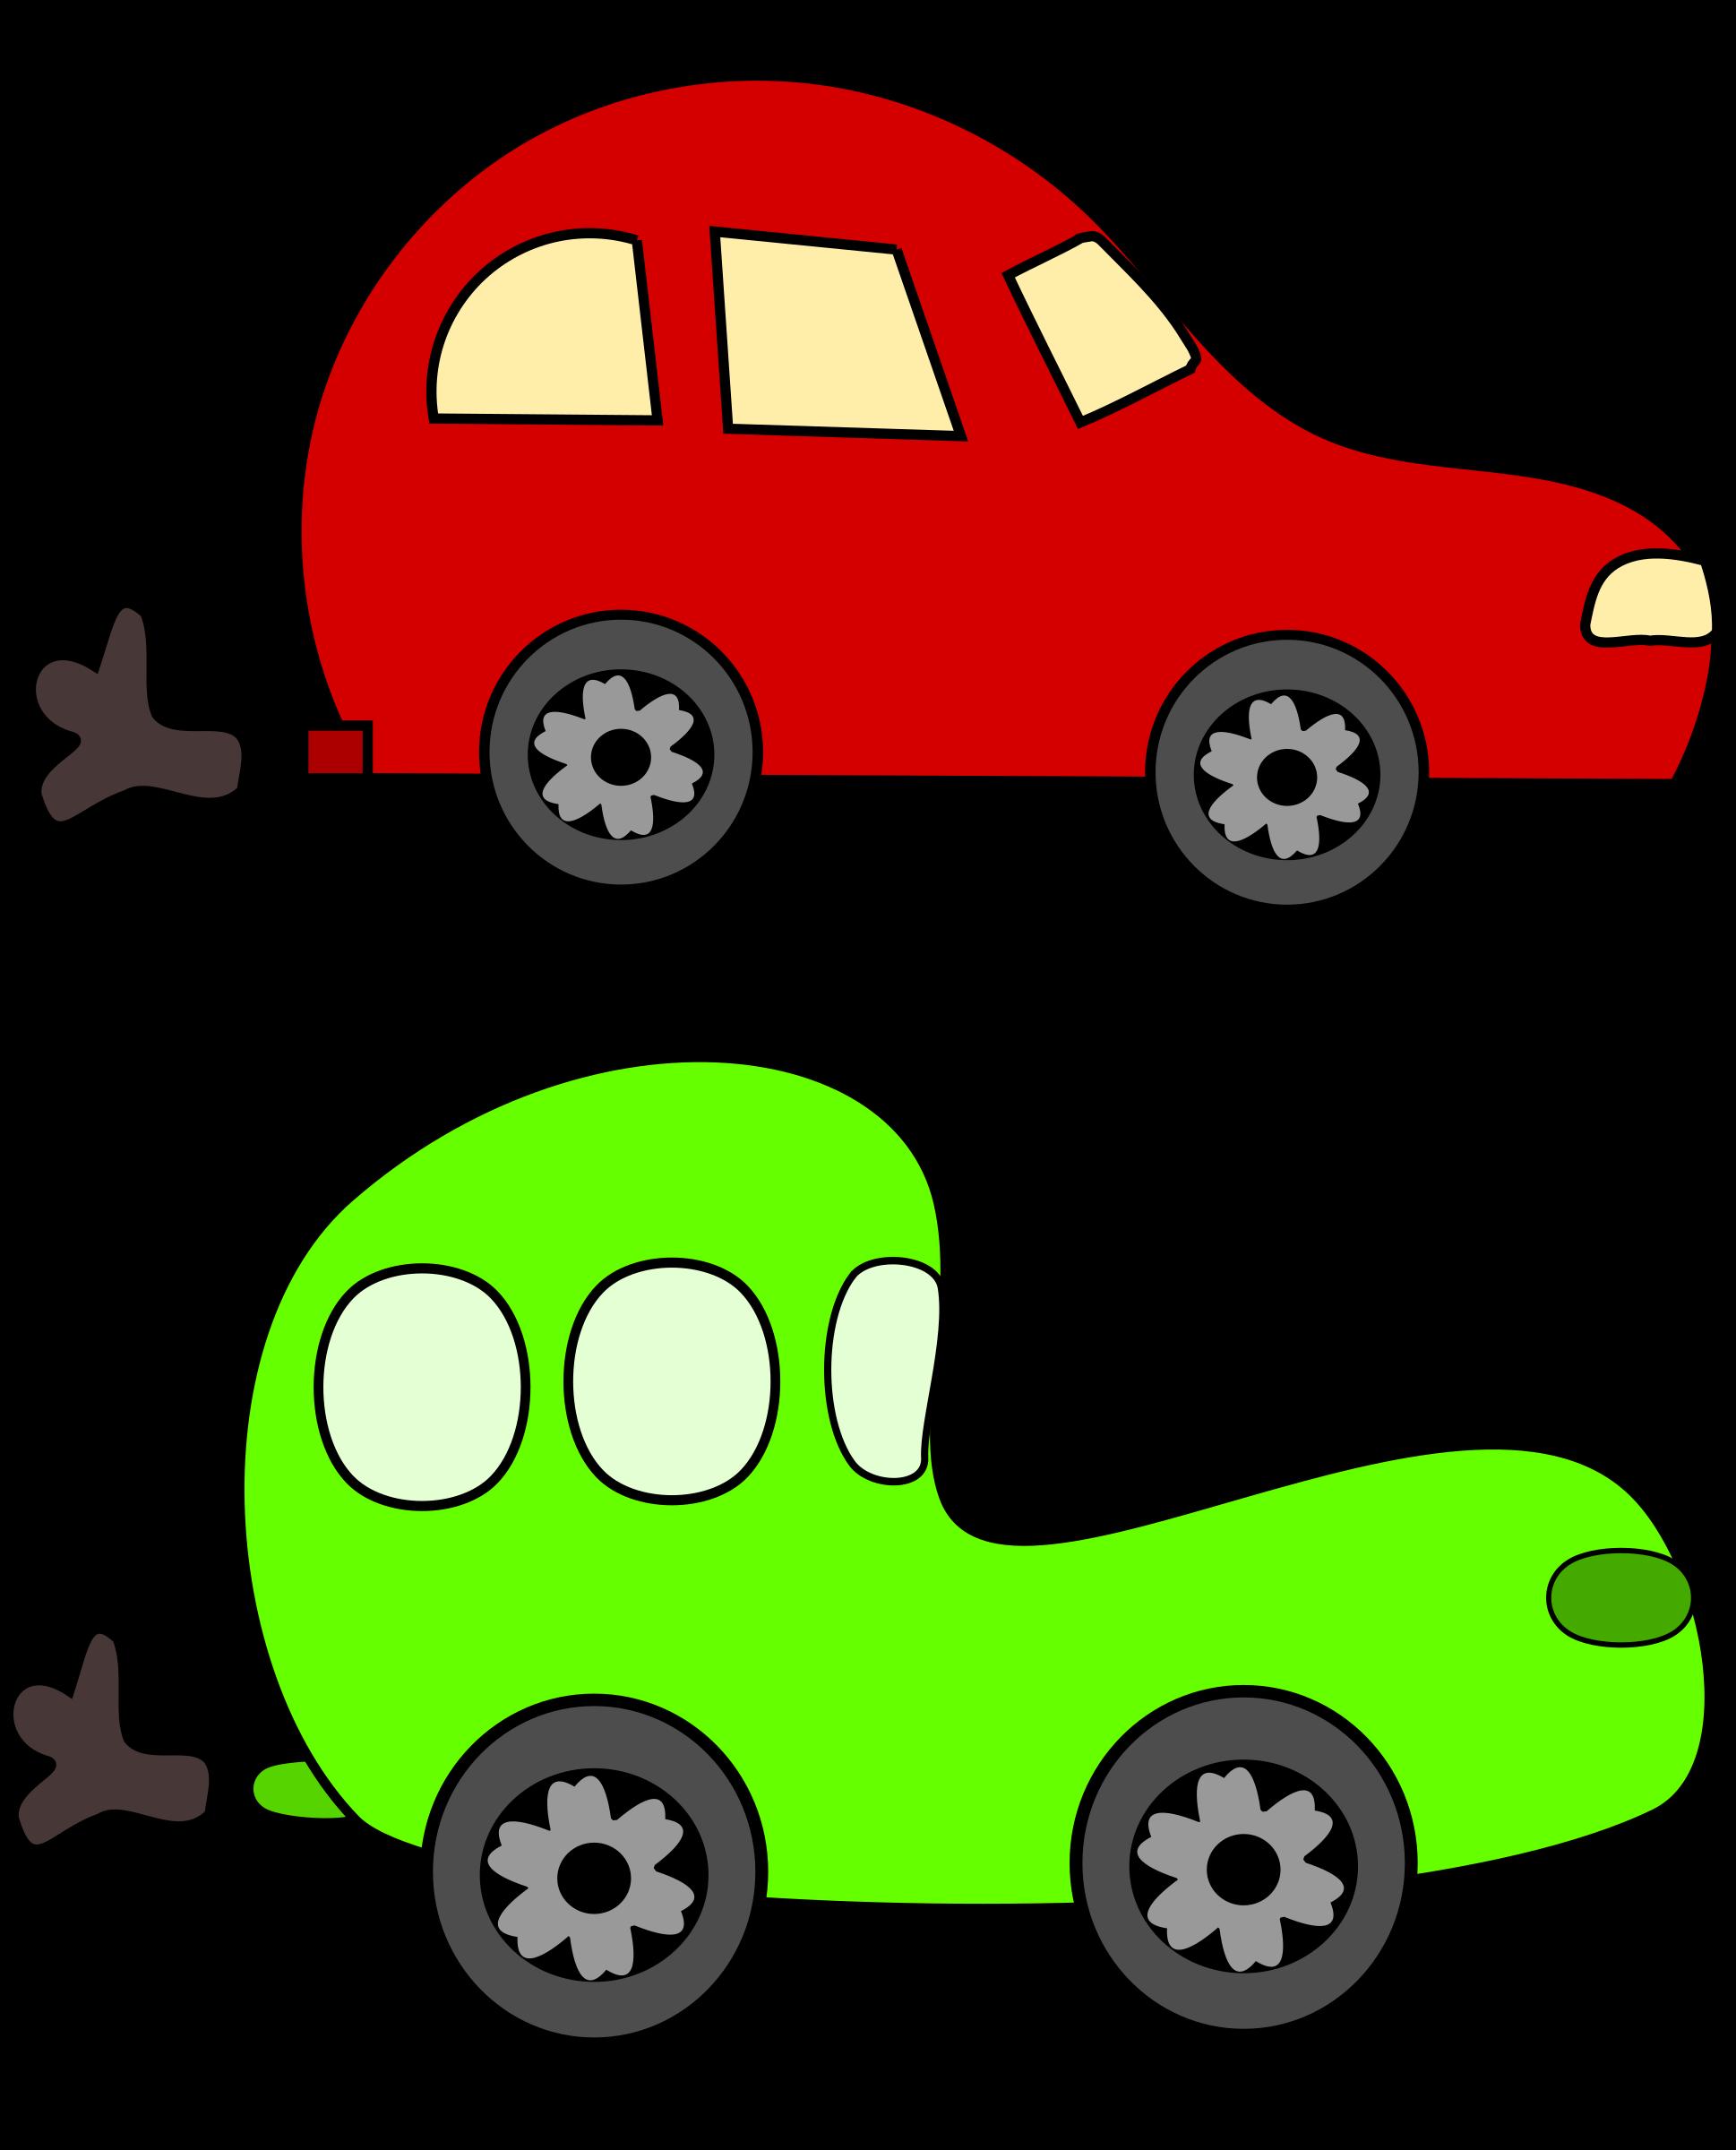 1938x2400 Car Cartoon Clip Art Clipart Green And Red Cars